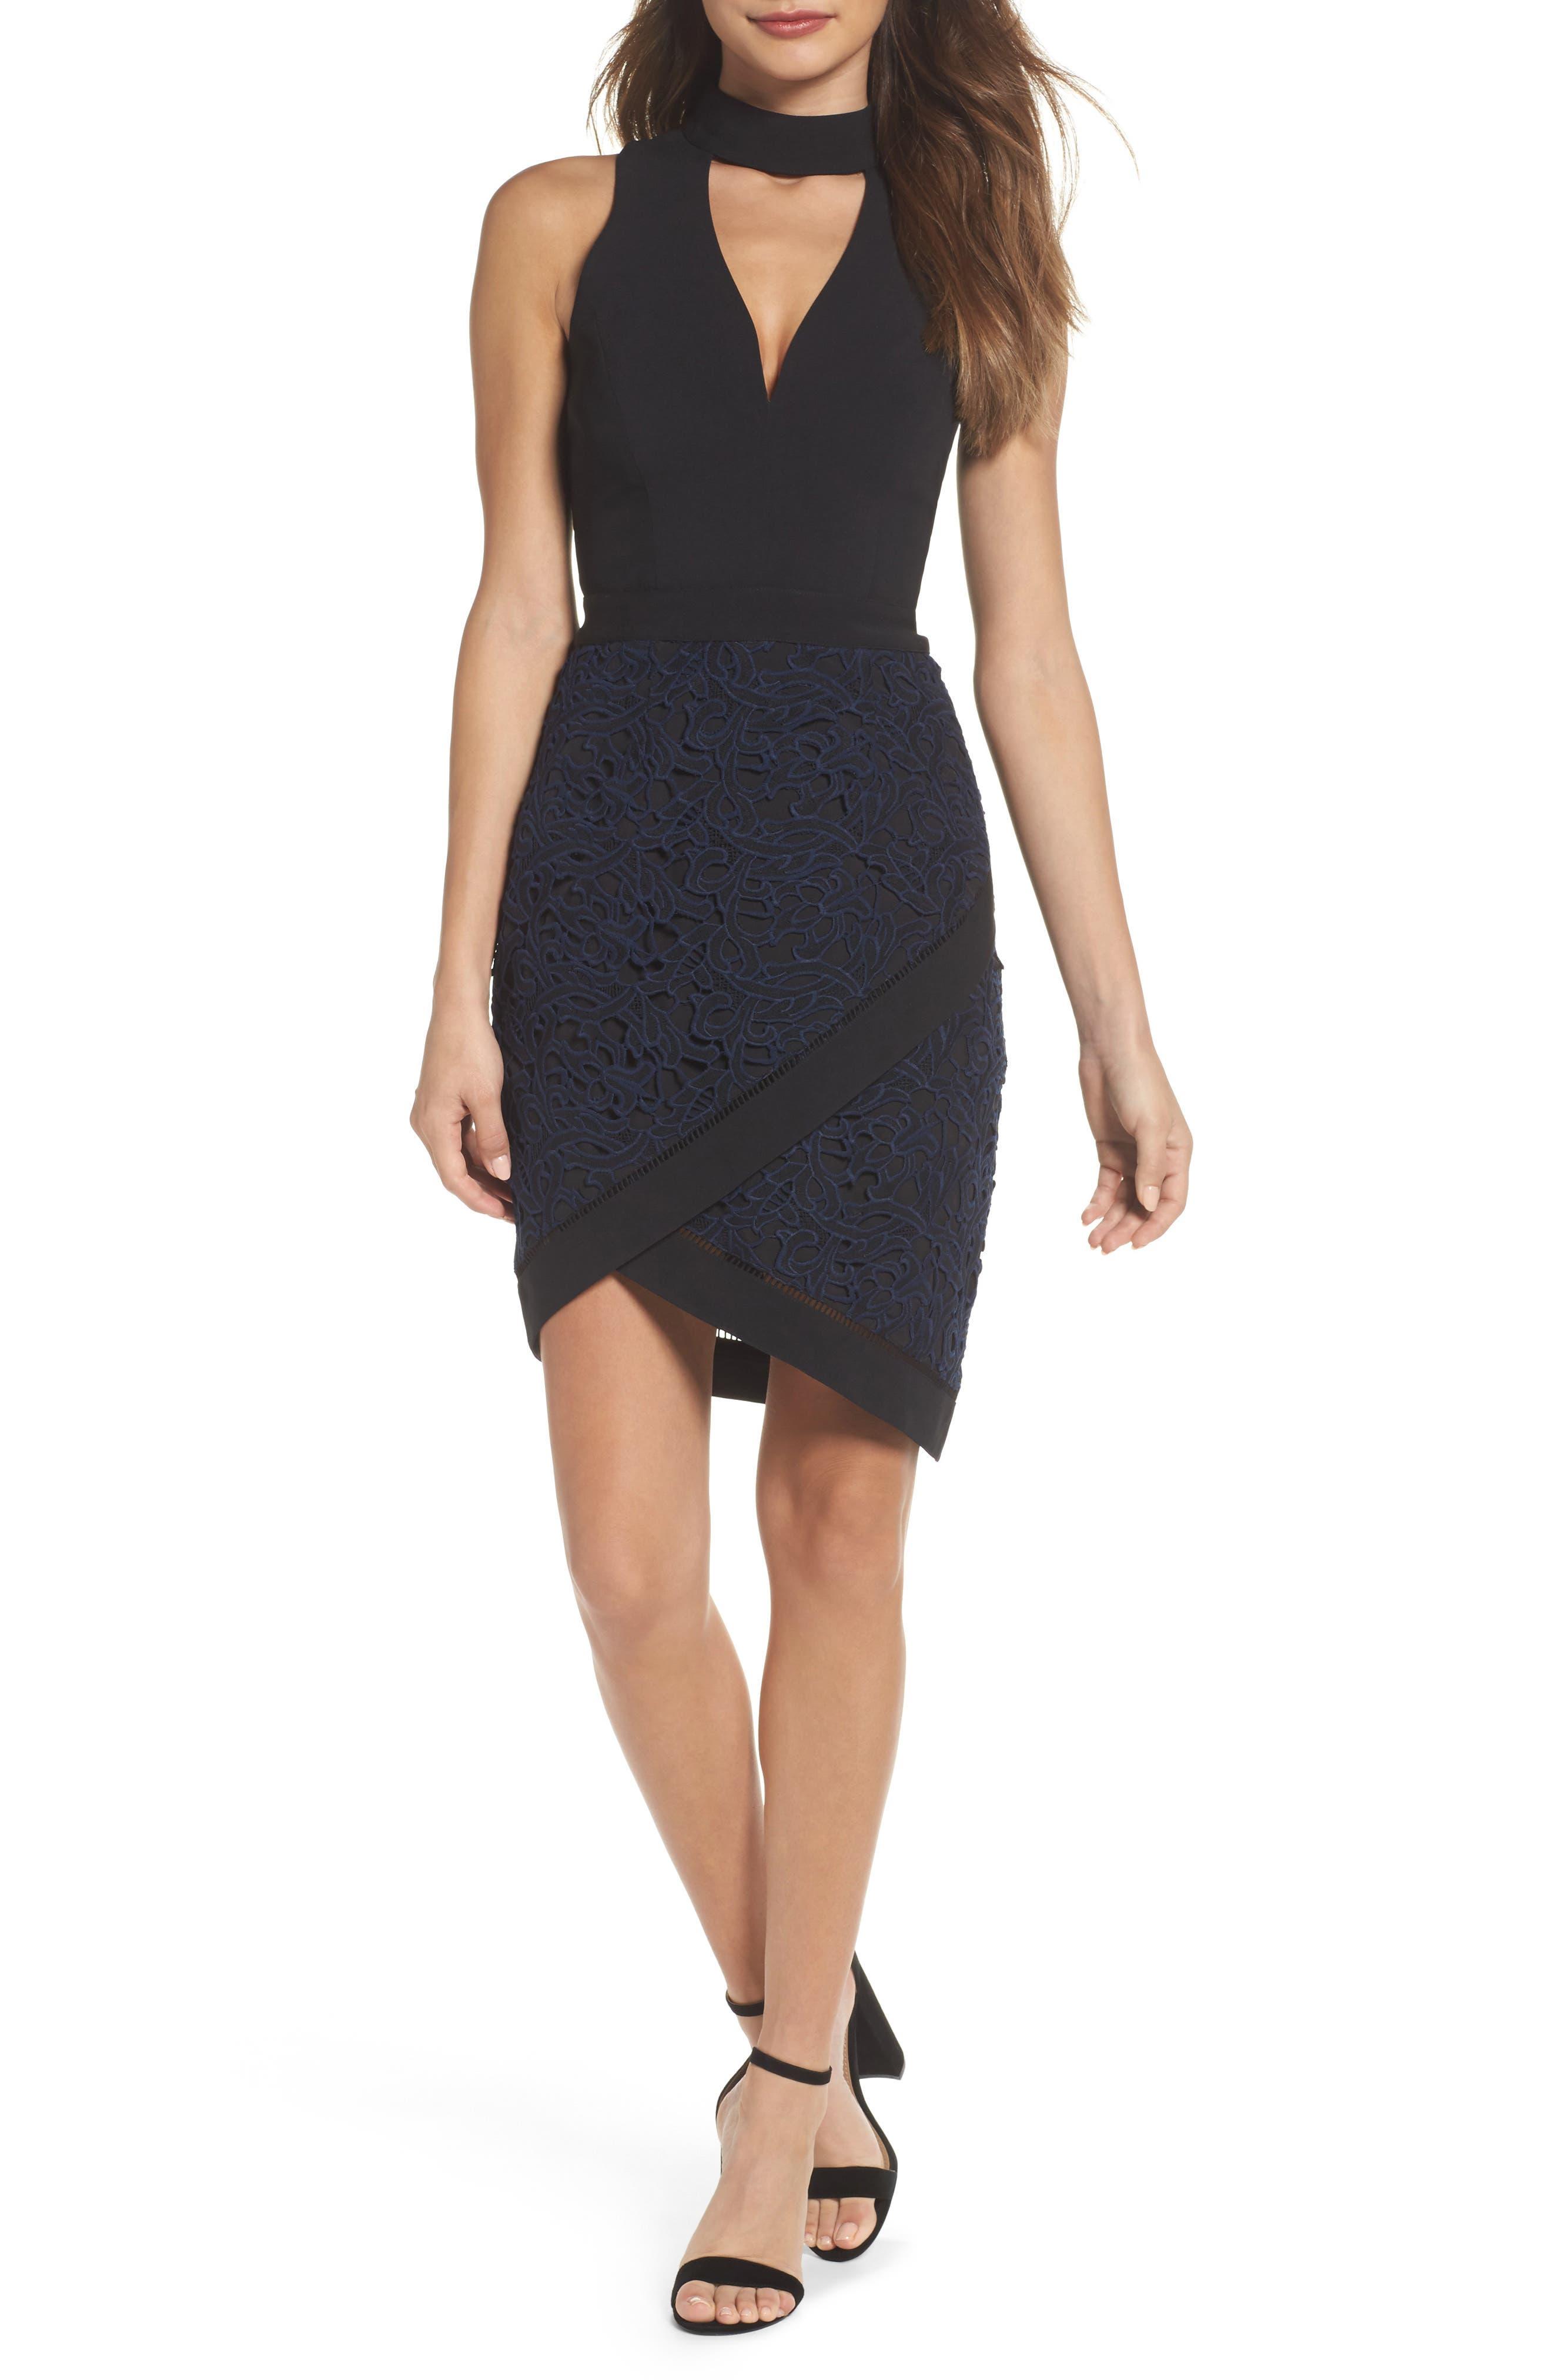 Choker Sheath Dress,                             Main thumbnail 1, color,                             Black/ Navy